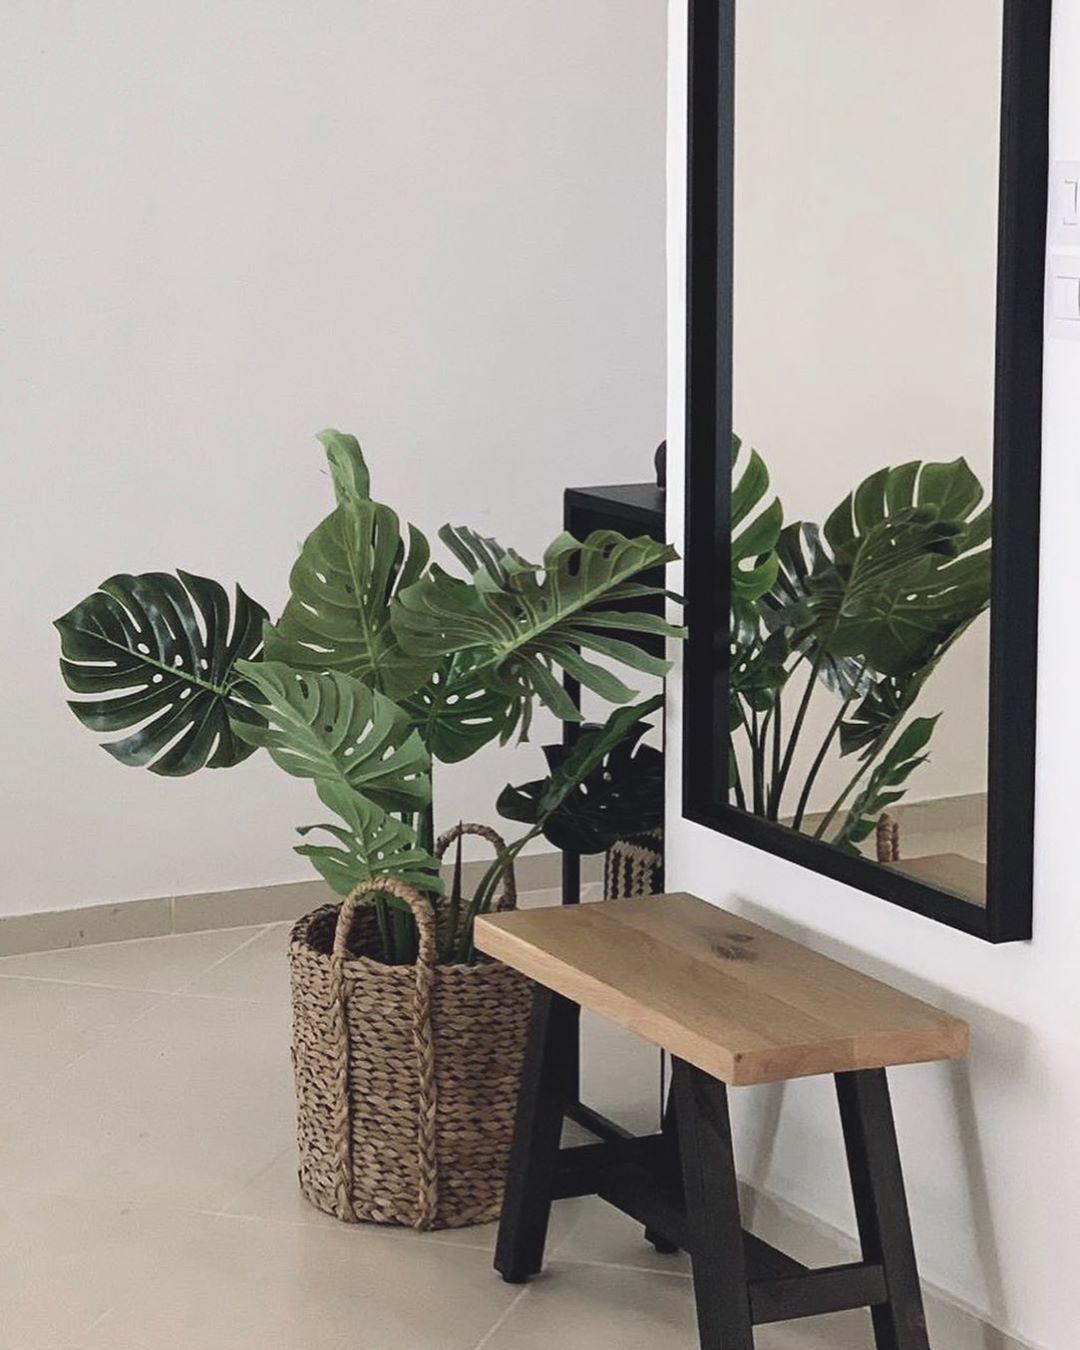 ᴸᴬˢᵀ ᶠᴿᴵᴰᴬᵞ ᴮᴱᶠᴼᴿᴱ ᴸᴼᶜᴷᴰᴼᵂᴺ! TOMORROW 09:00-13:30🔛 . . . #black #friday #studio #lockdown #industrial #home #homestyling #homedesign #decor #decoraddict #lovedecor #design #style #homegashion #nordic #nordicstyle #minimalist #minimalism #monochrome #monochromatic #iron #industrialdecor #wood #recycle